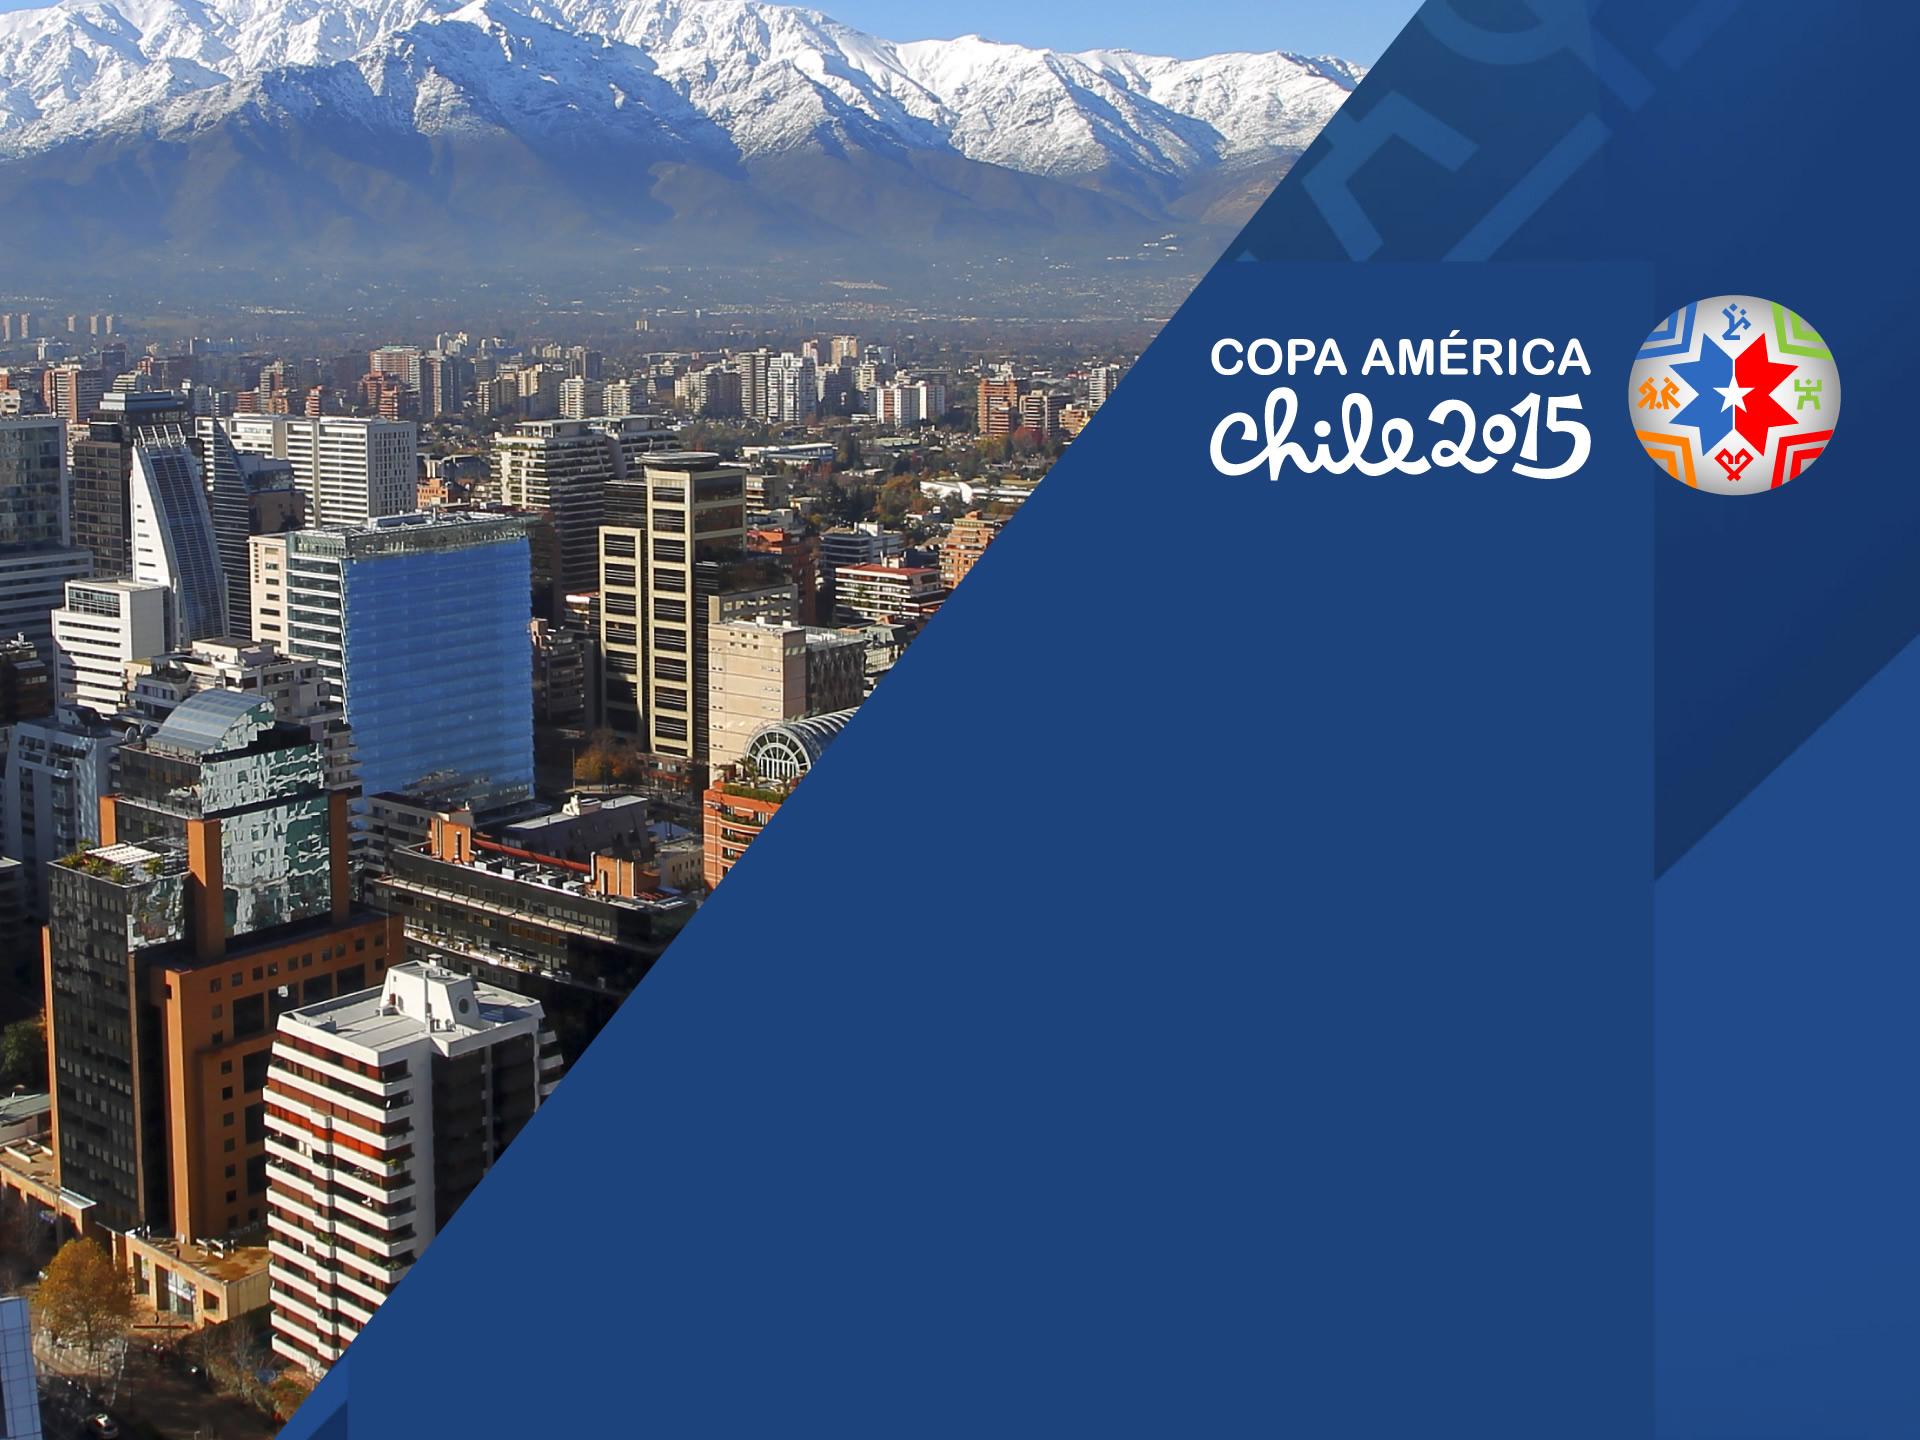 copaamerica_slide